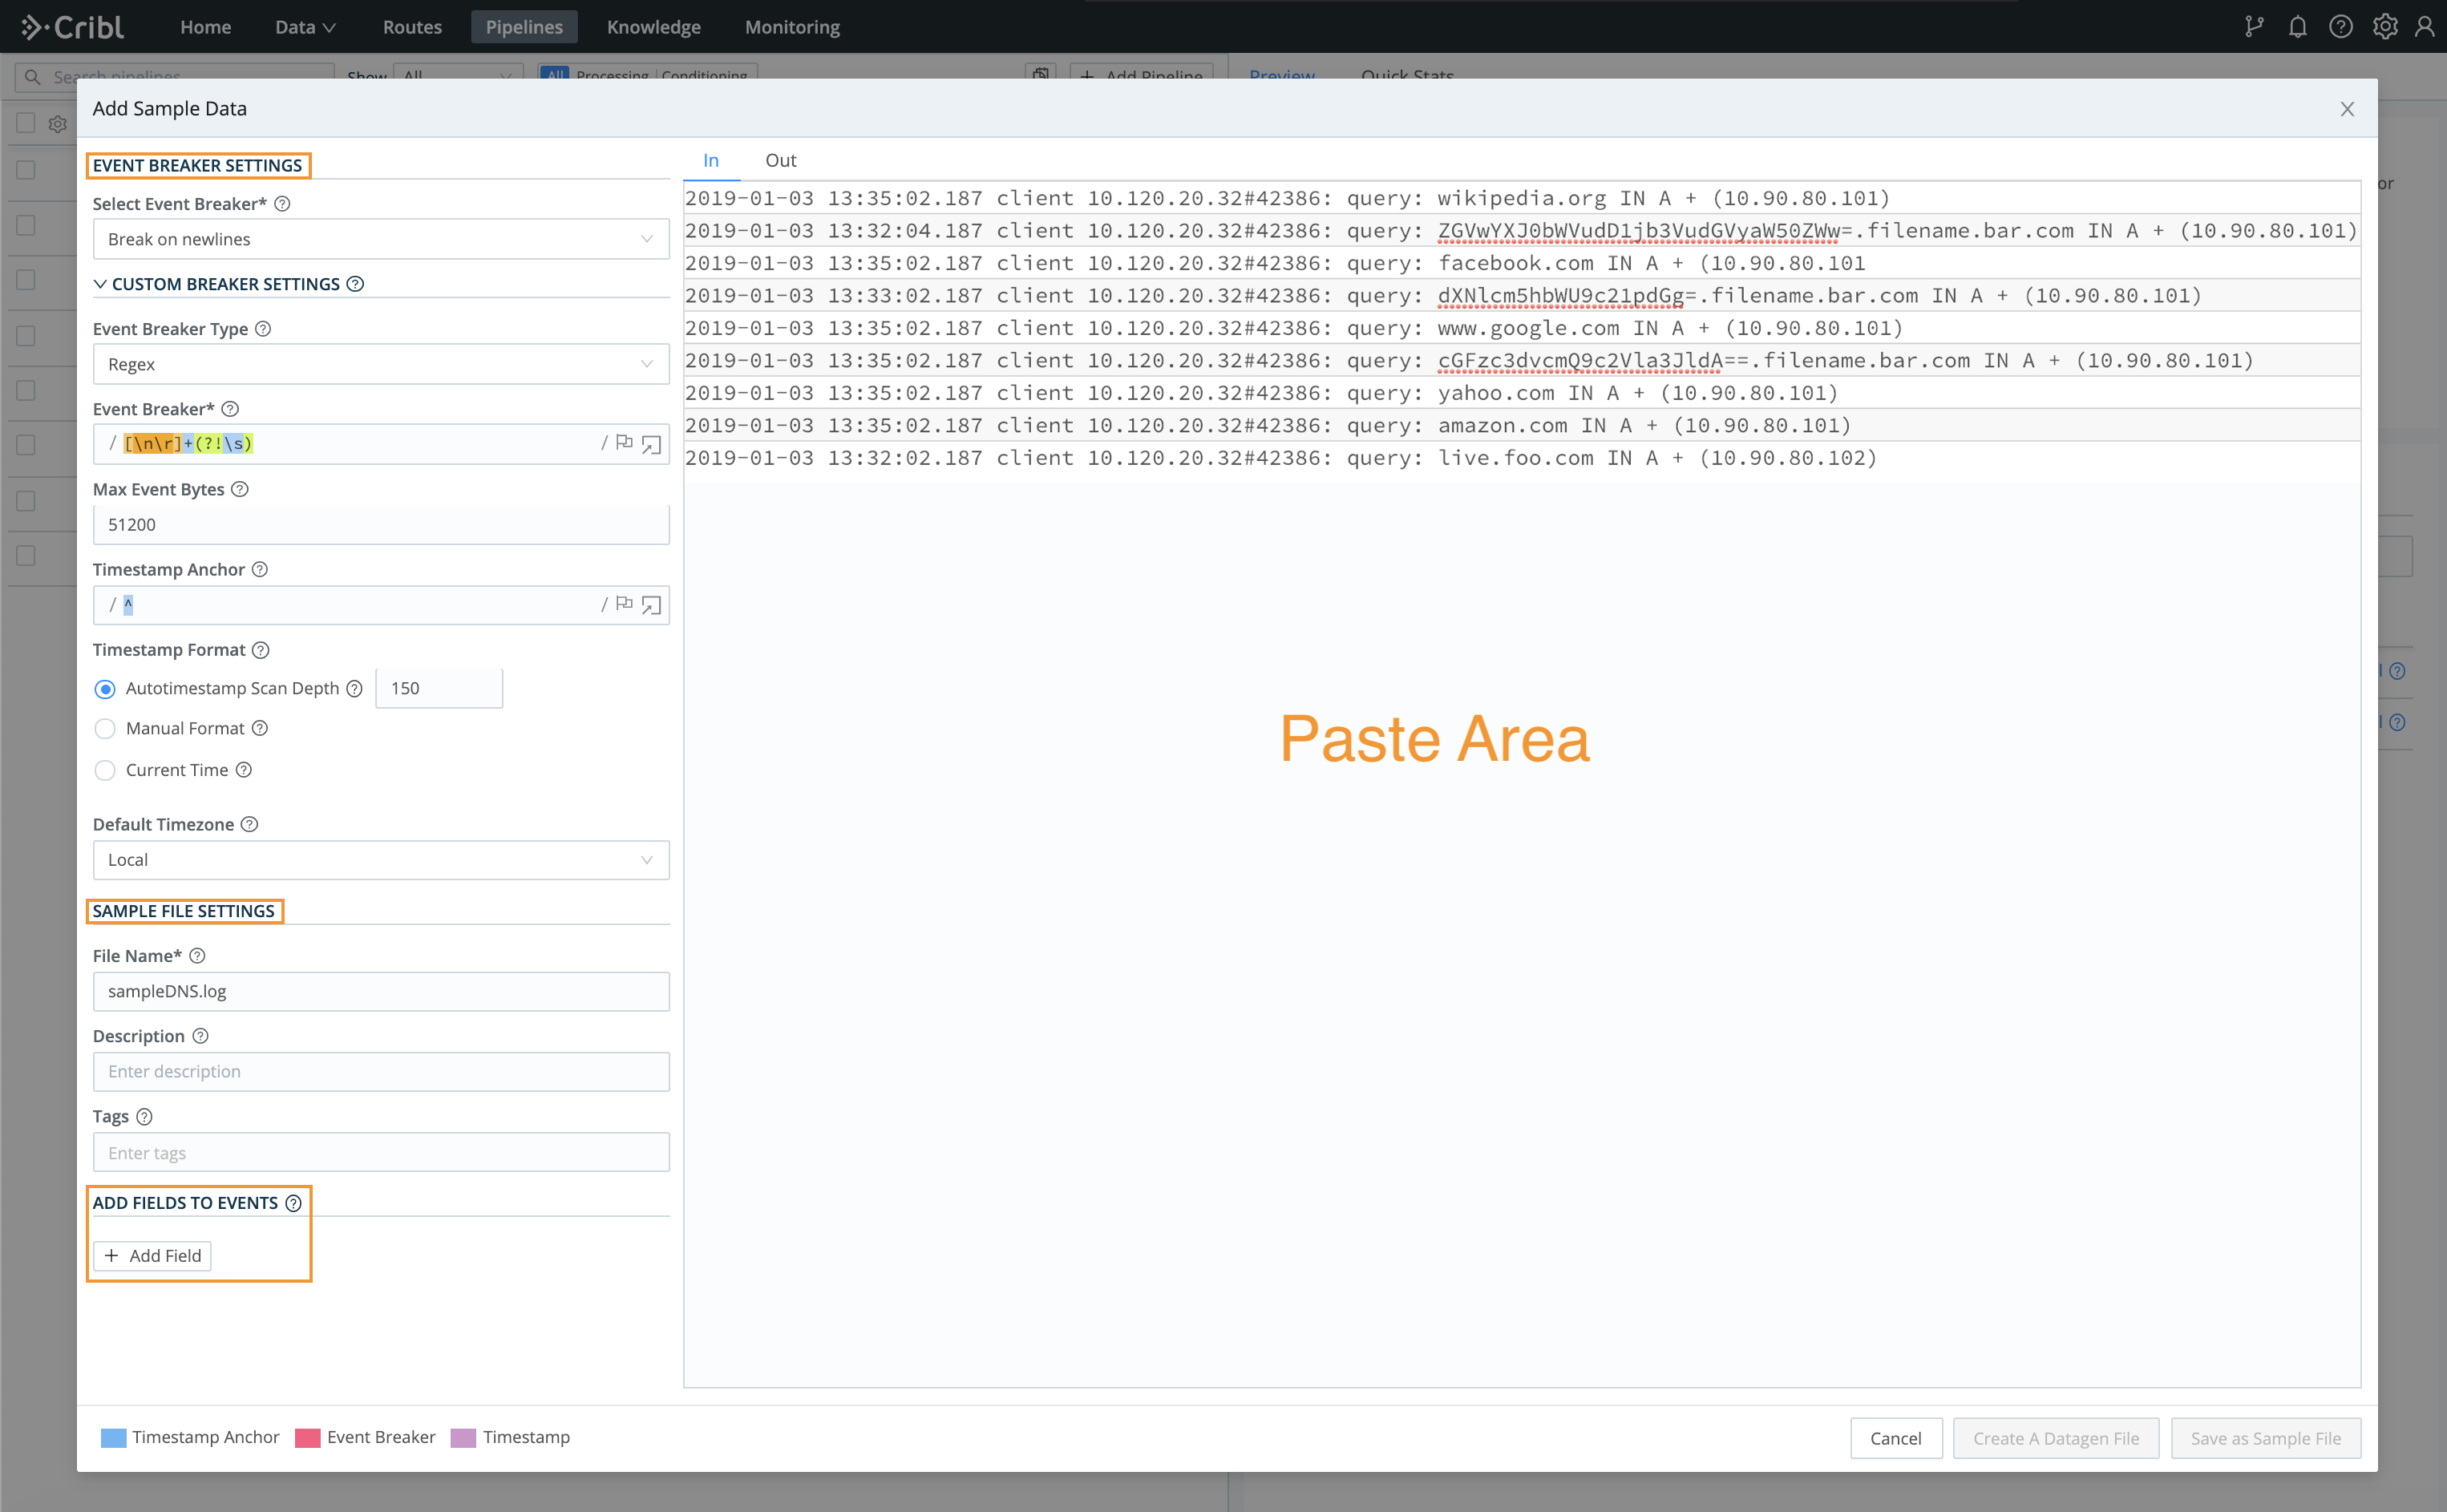 Add Sample Data modal